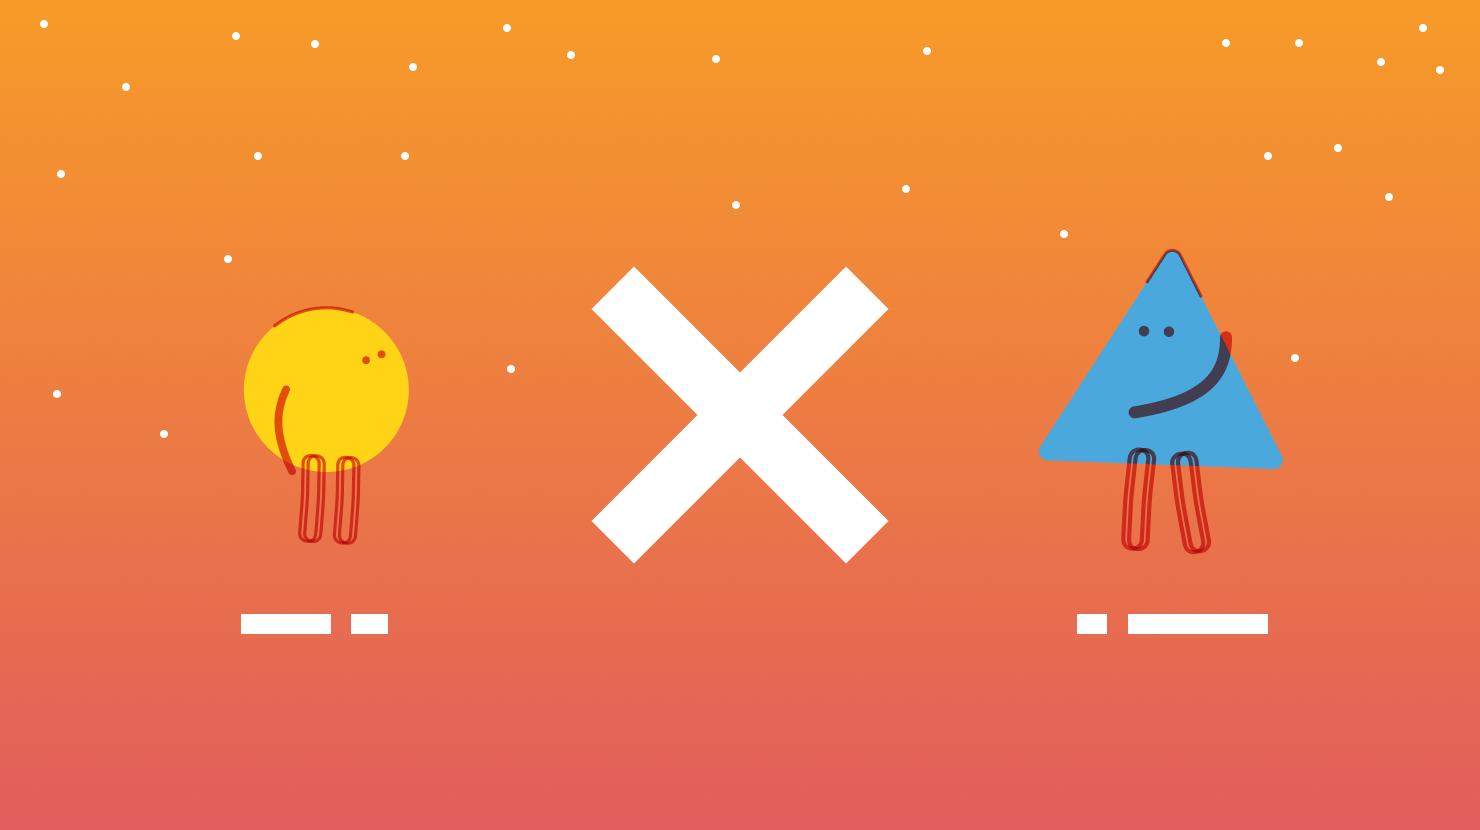 collaboration-vs-cooperation-16x9